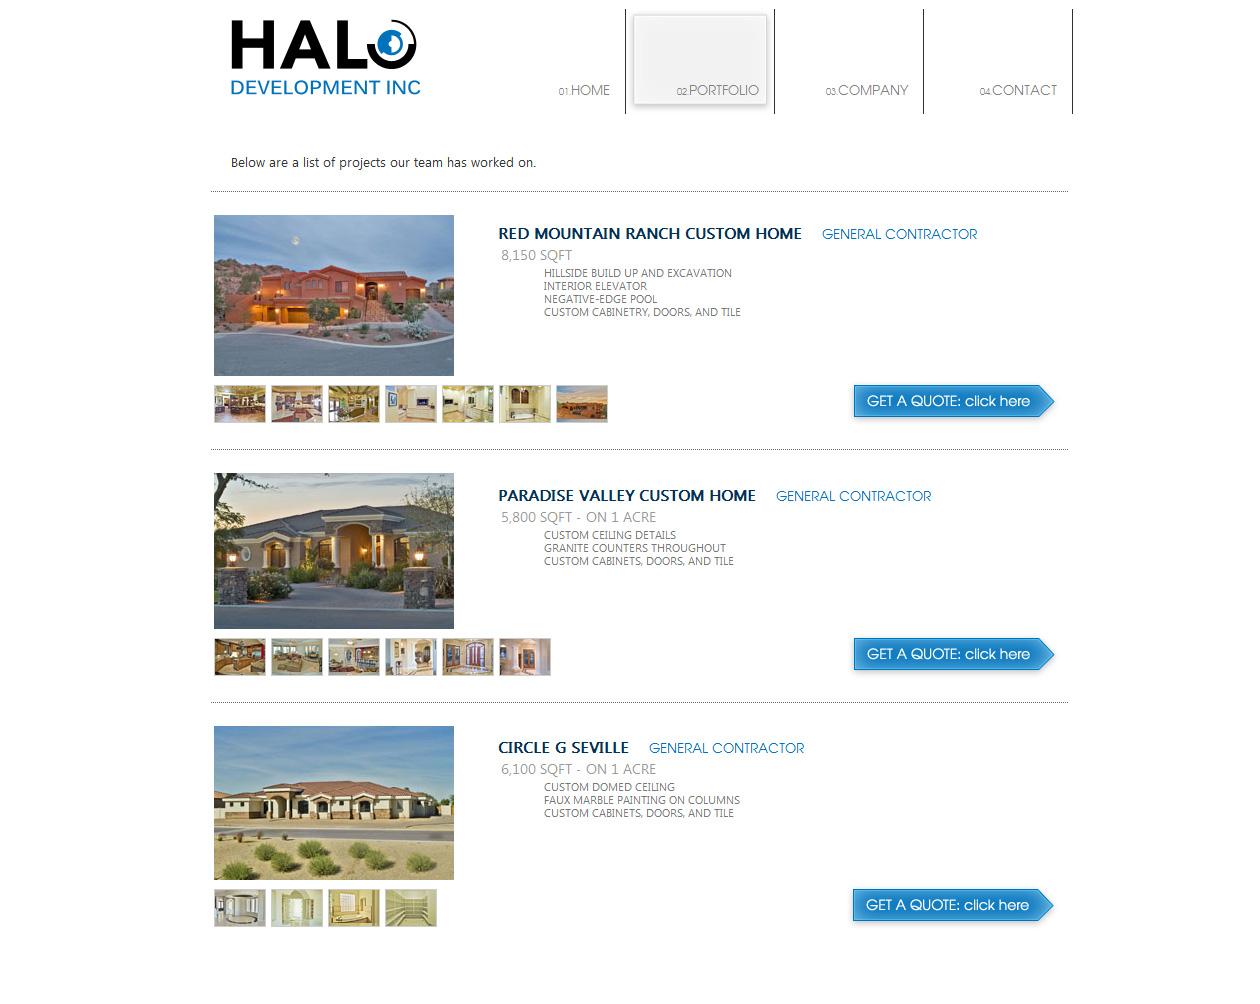 Halo_gallery